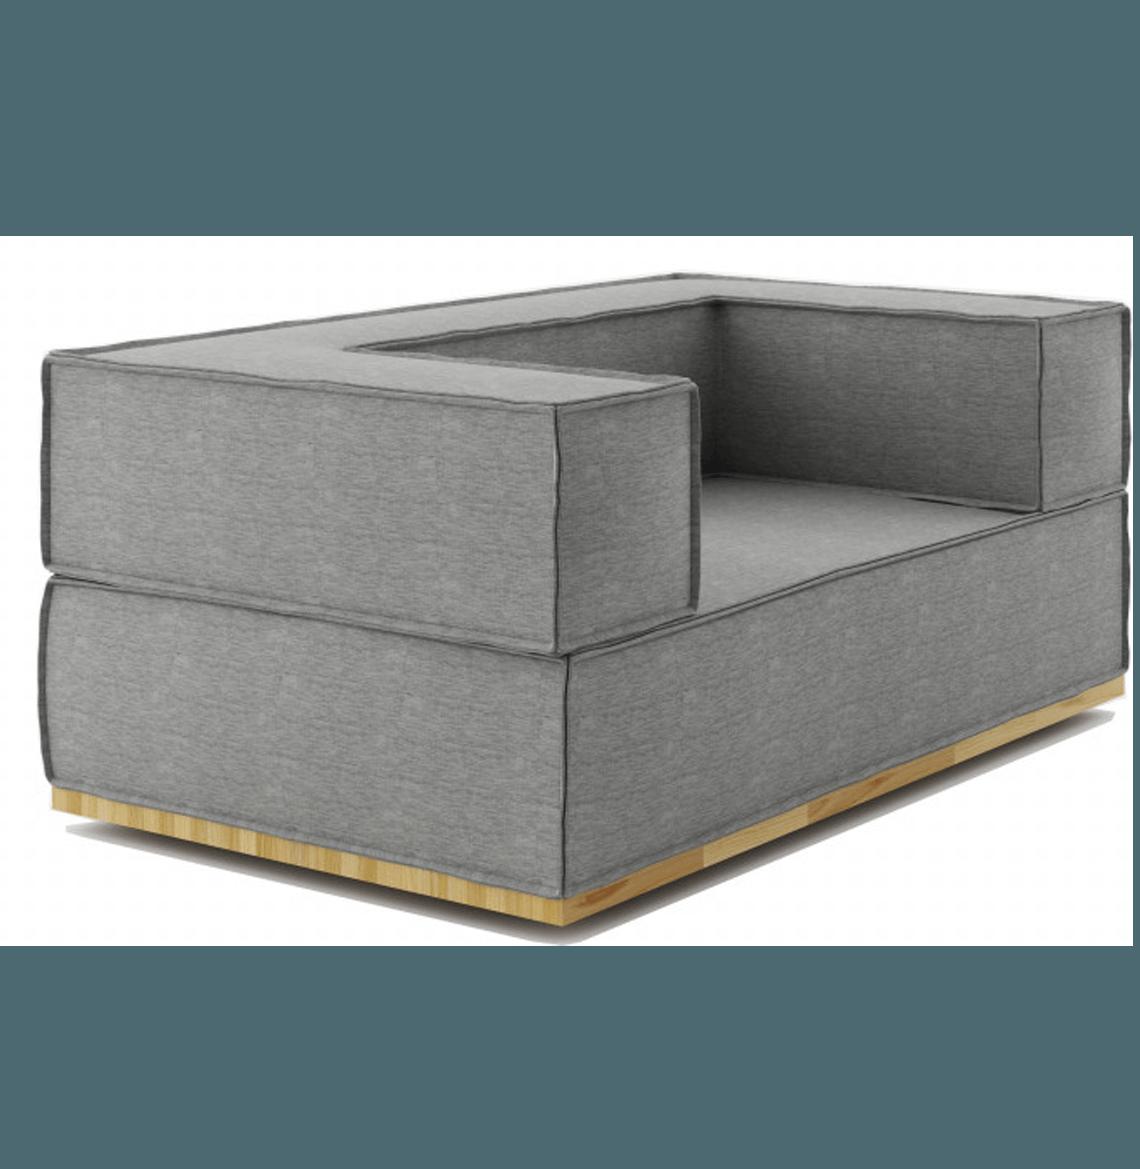 Sofa Bed 150 Natural – Colectia NOI